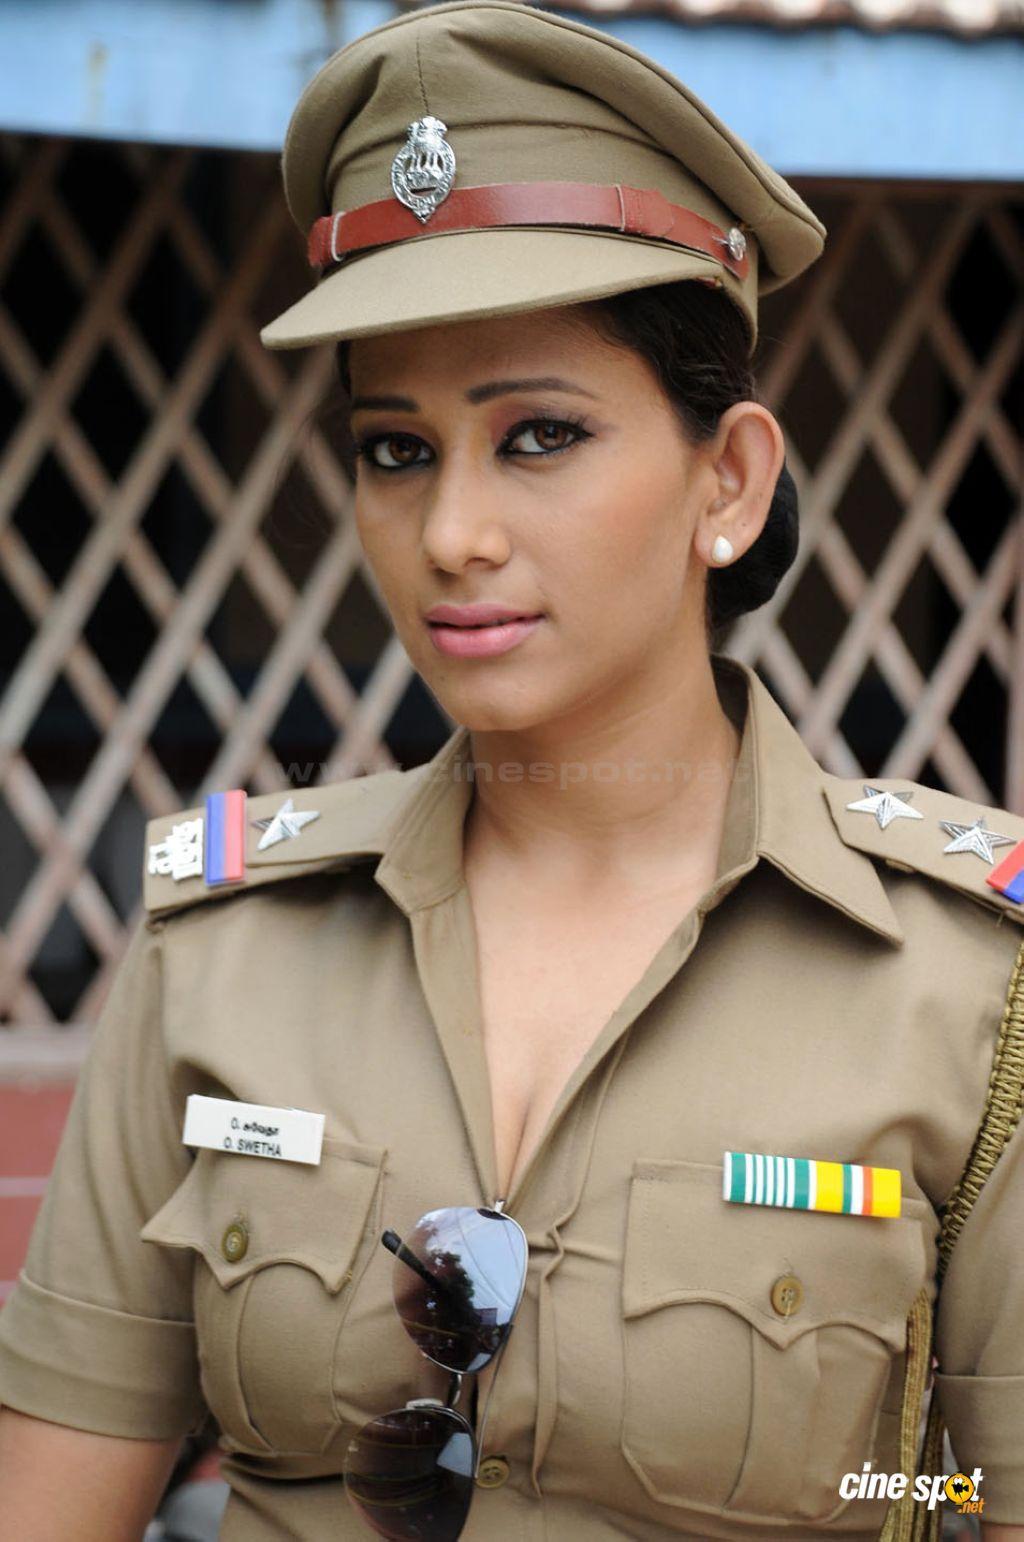 Pin By Bhagat Singh Charan On Sanjana Singh  Military -5766